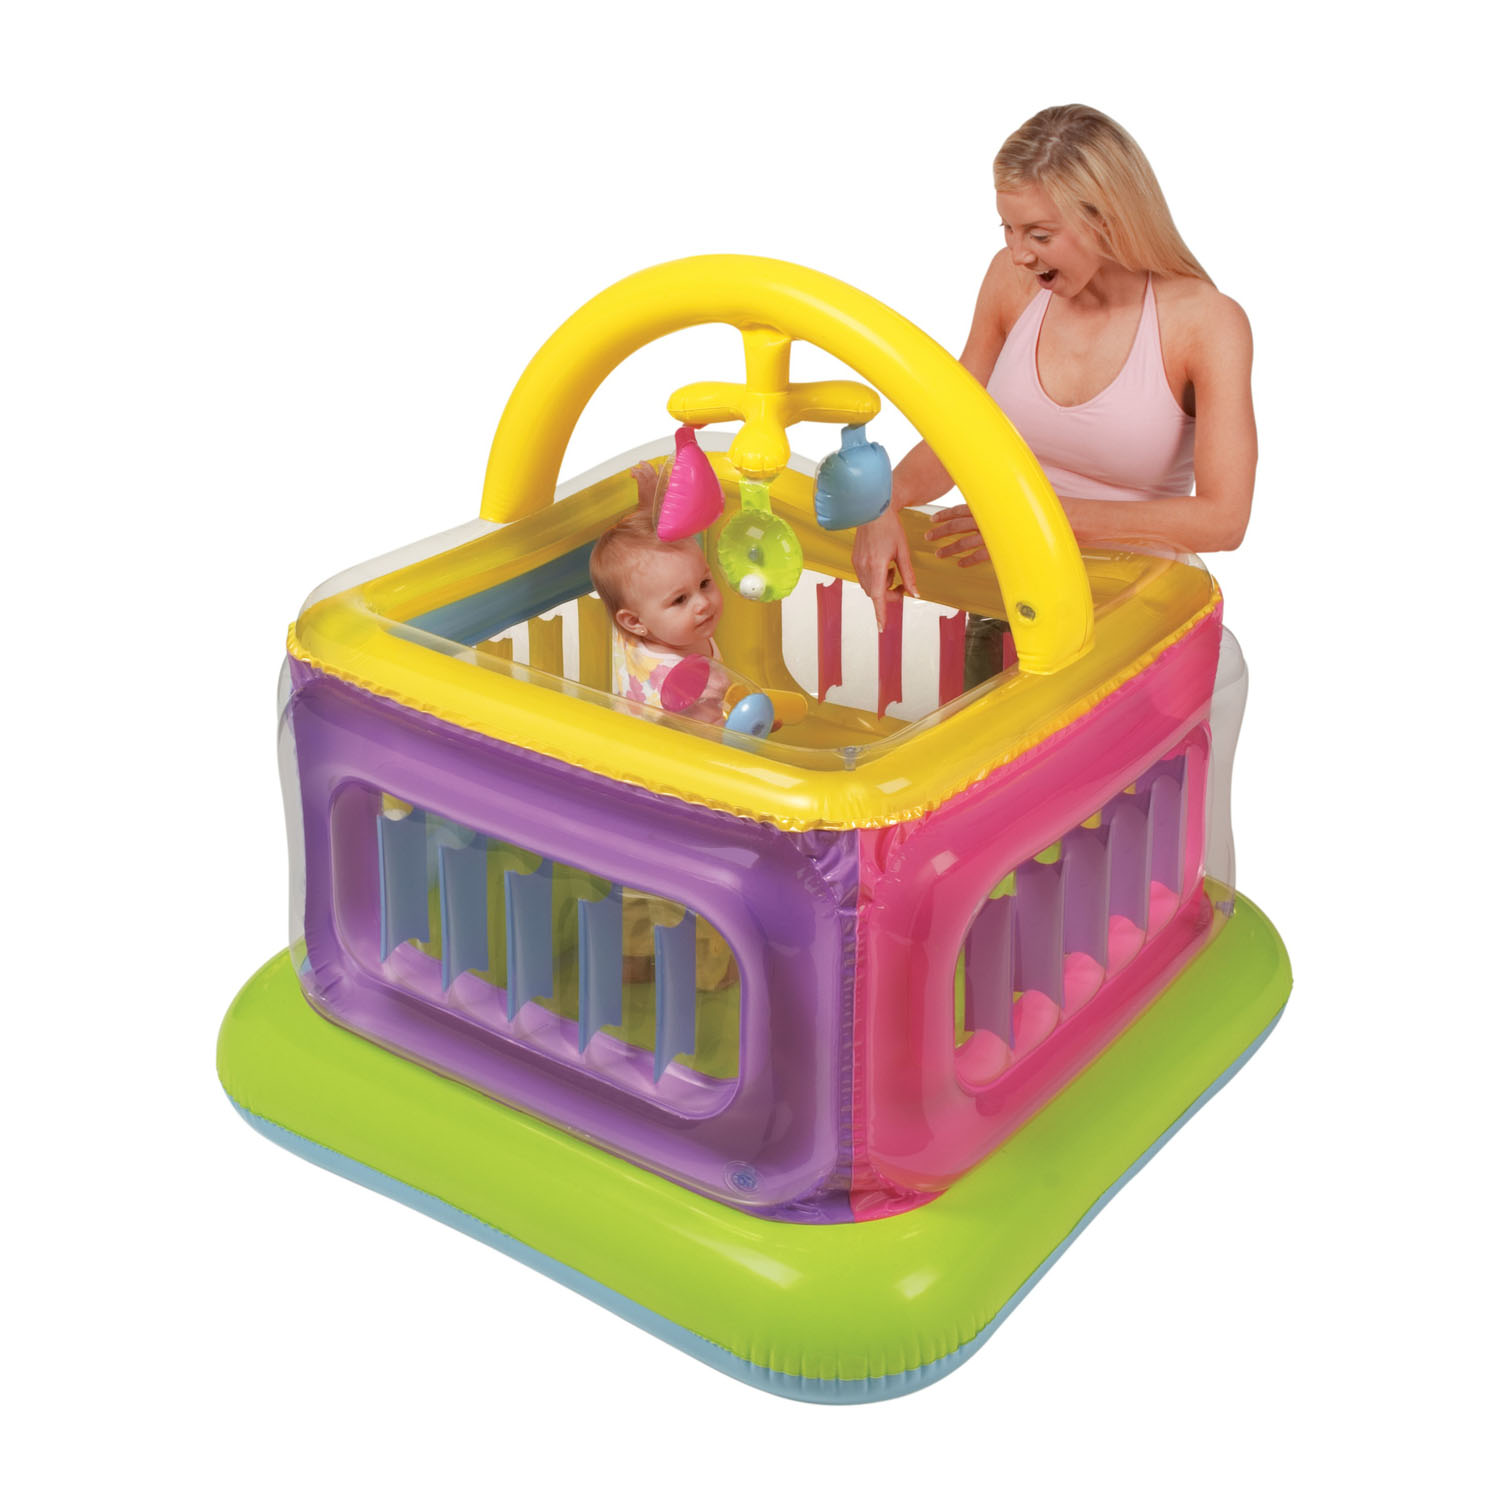 48472 Манеж детский с игрушками 117х117х114см АКЦИЯ!!!!!